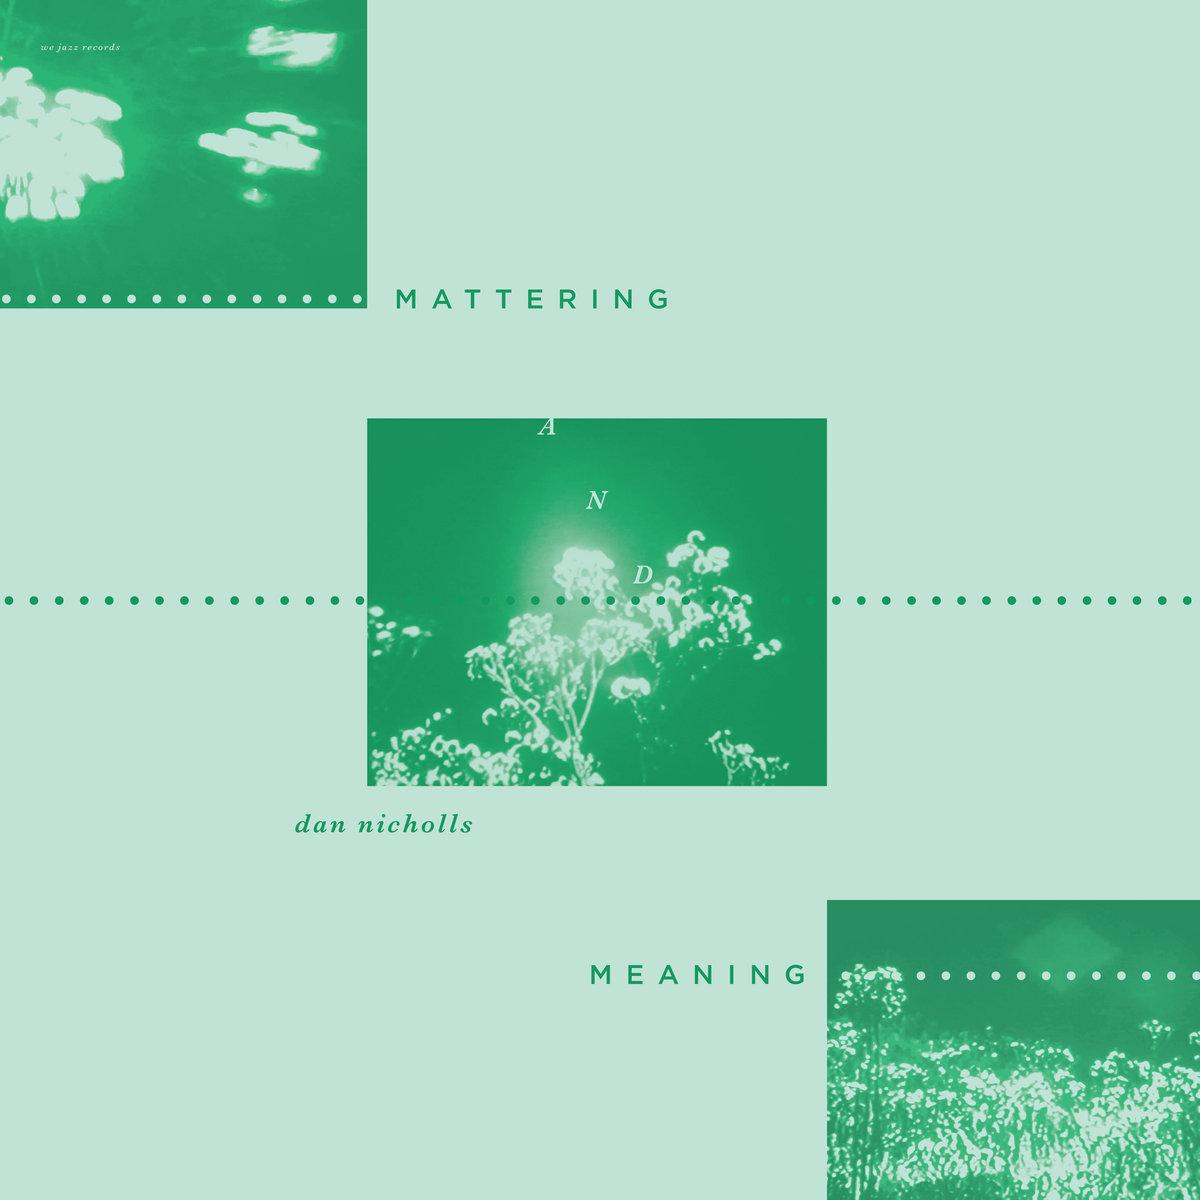 Dan Nicholls : Mattering and Meaning